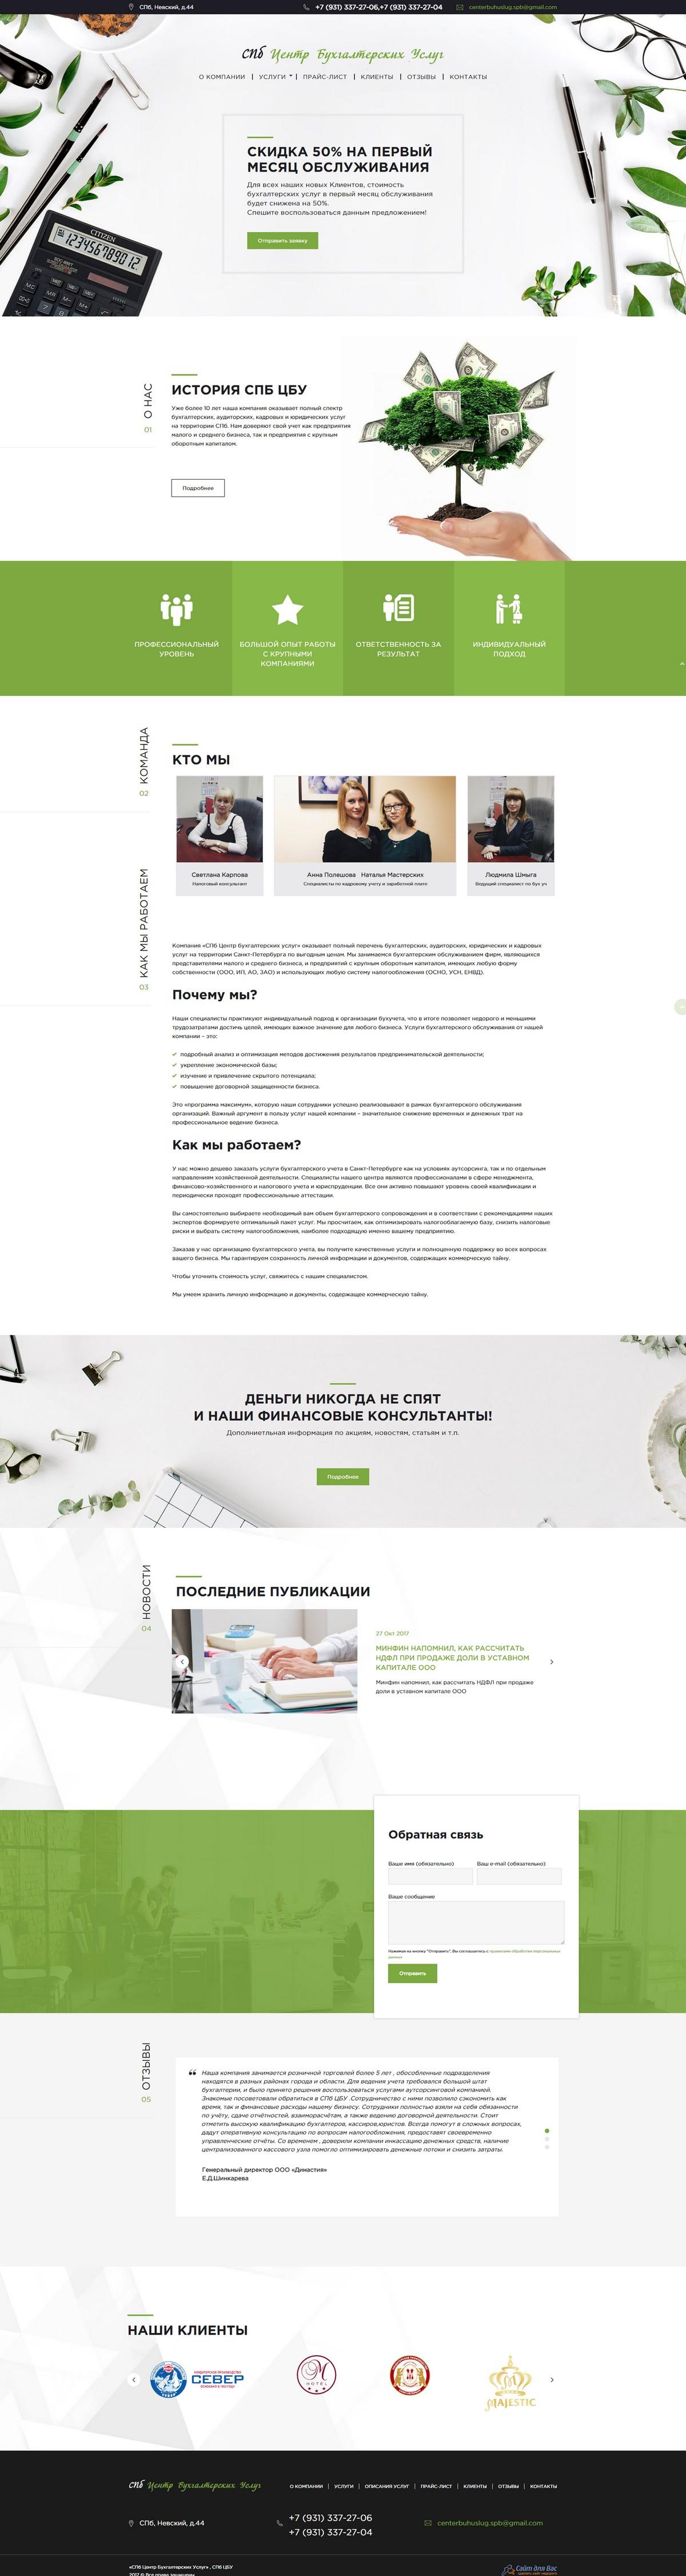 полноразмерный скриншот сайта http://centerbuhuslugspb.ru/